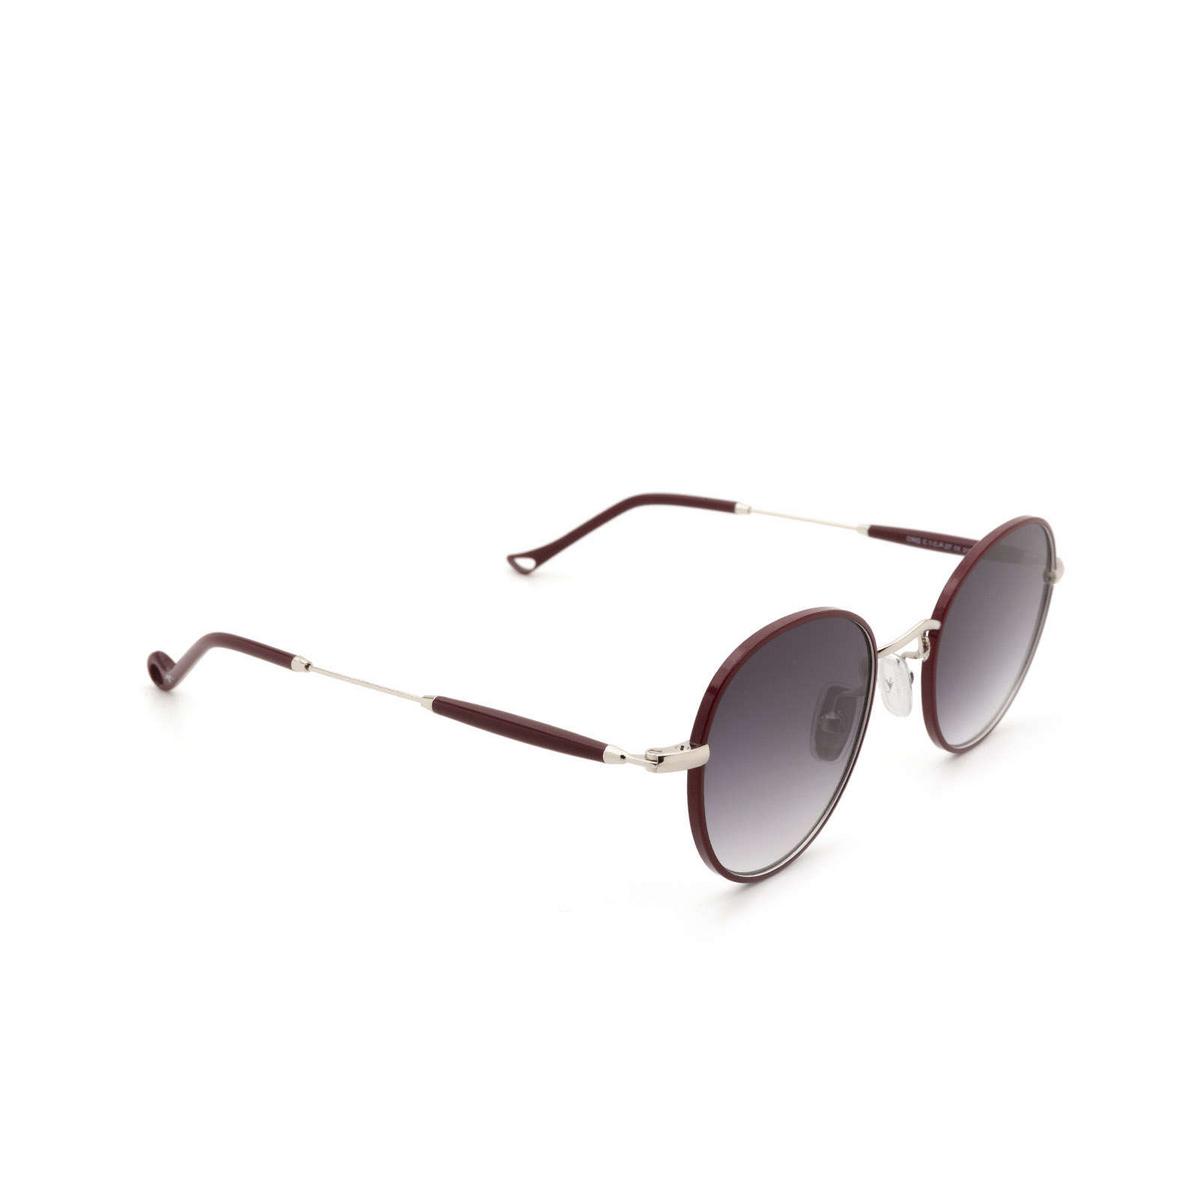 Eyepetizer® Round Sunglasses: Cinq color Bordeaux C.1-C-P-27 - three-quarters view.